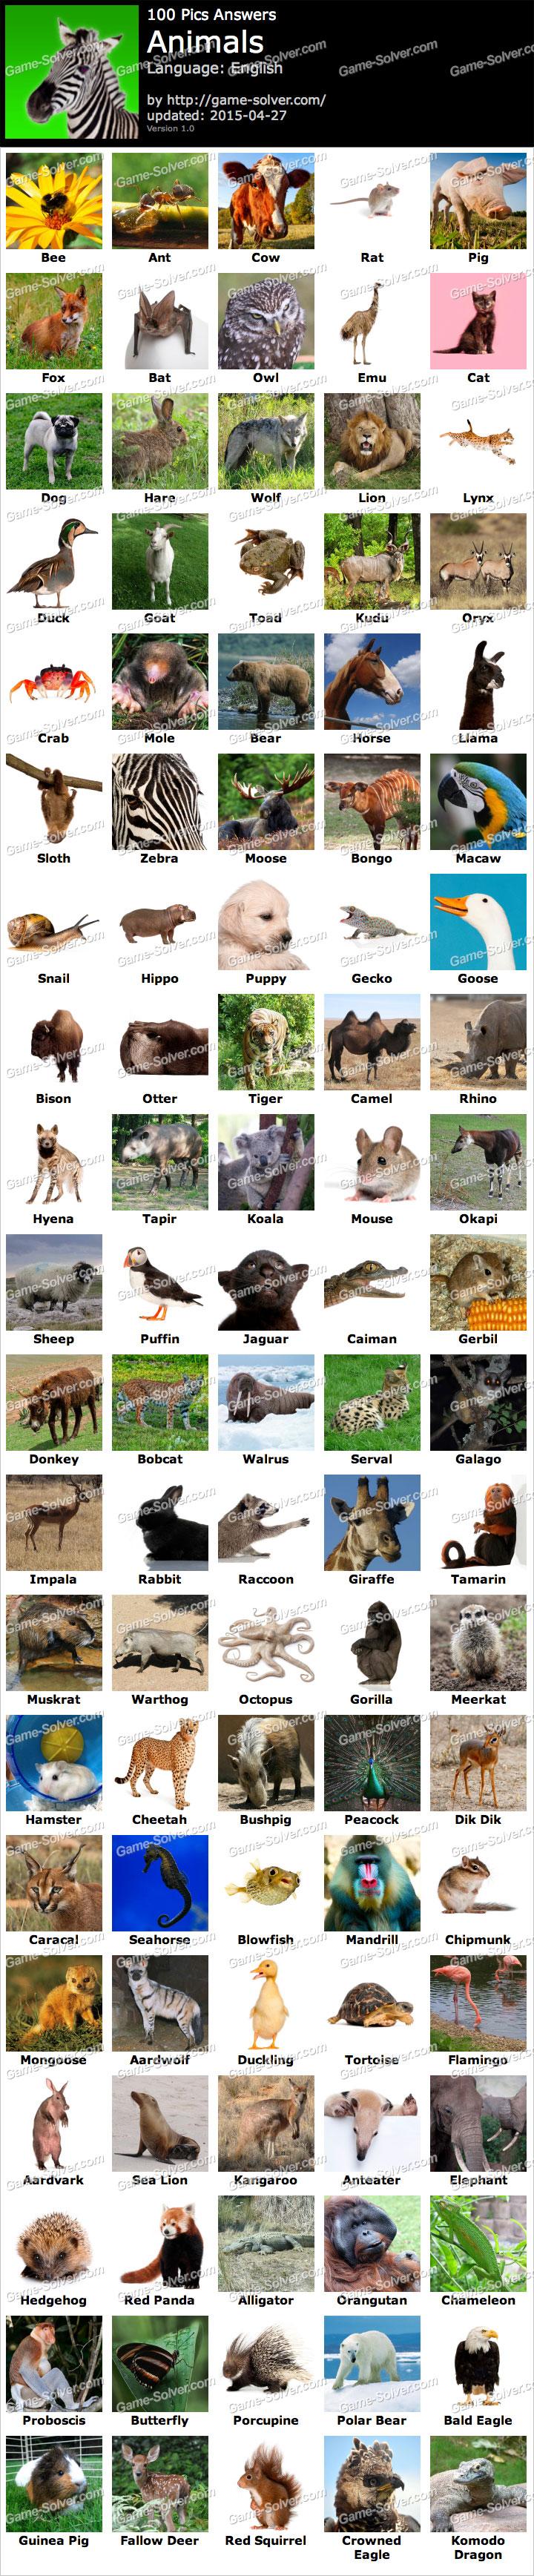 Animals 100 Pics Answers Android 100 Pics Animals